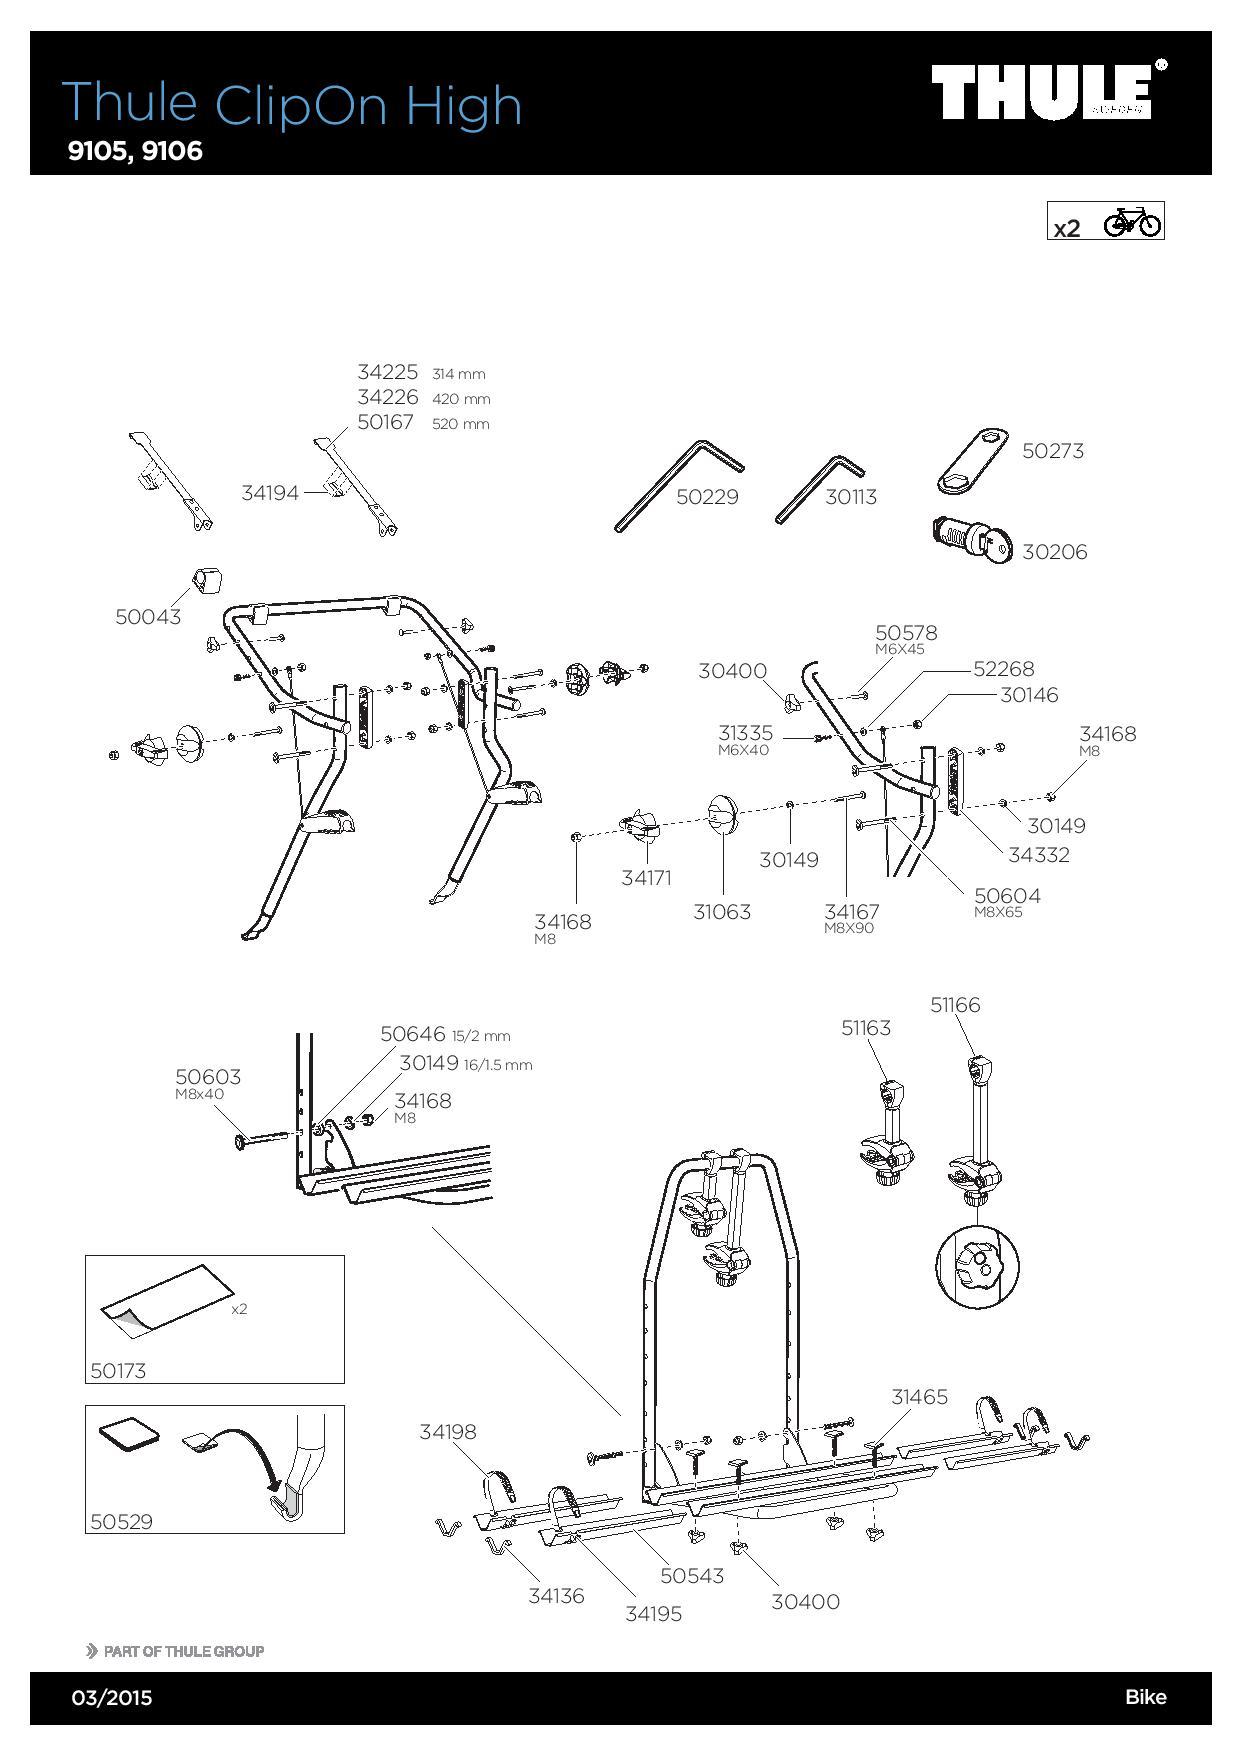 thule 9105 porte v los clipon high meovia boutique d. Black Bedroom Furniture Sets. Home Design Ideas